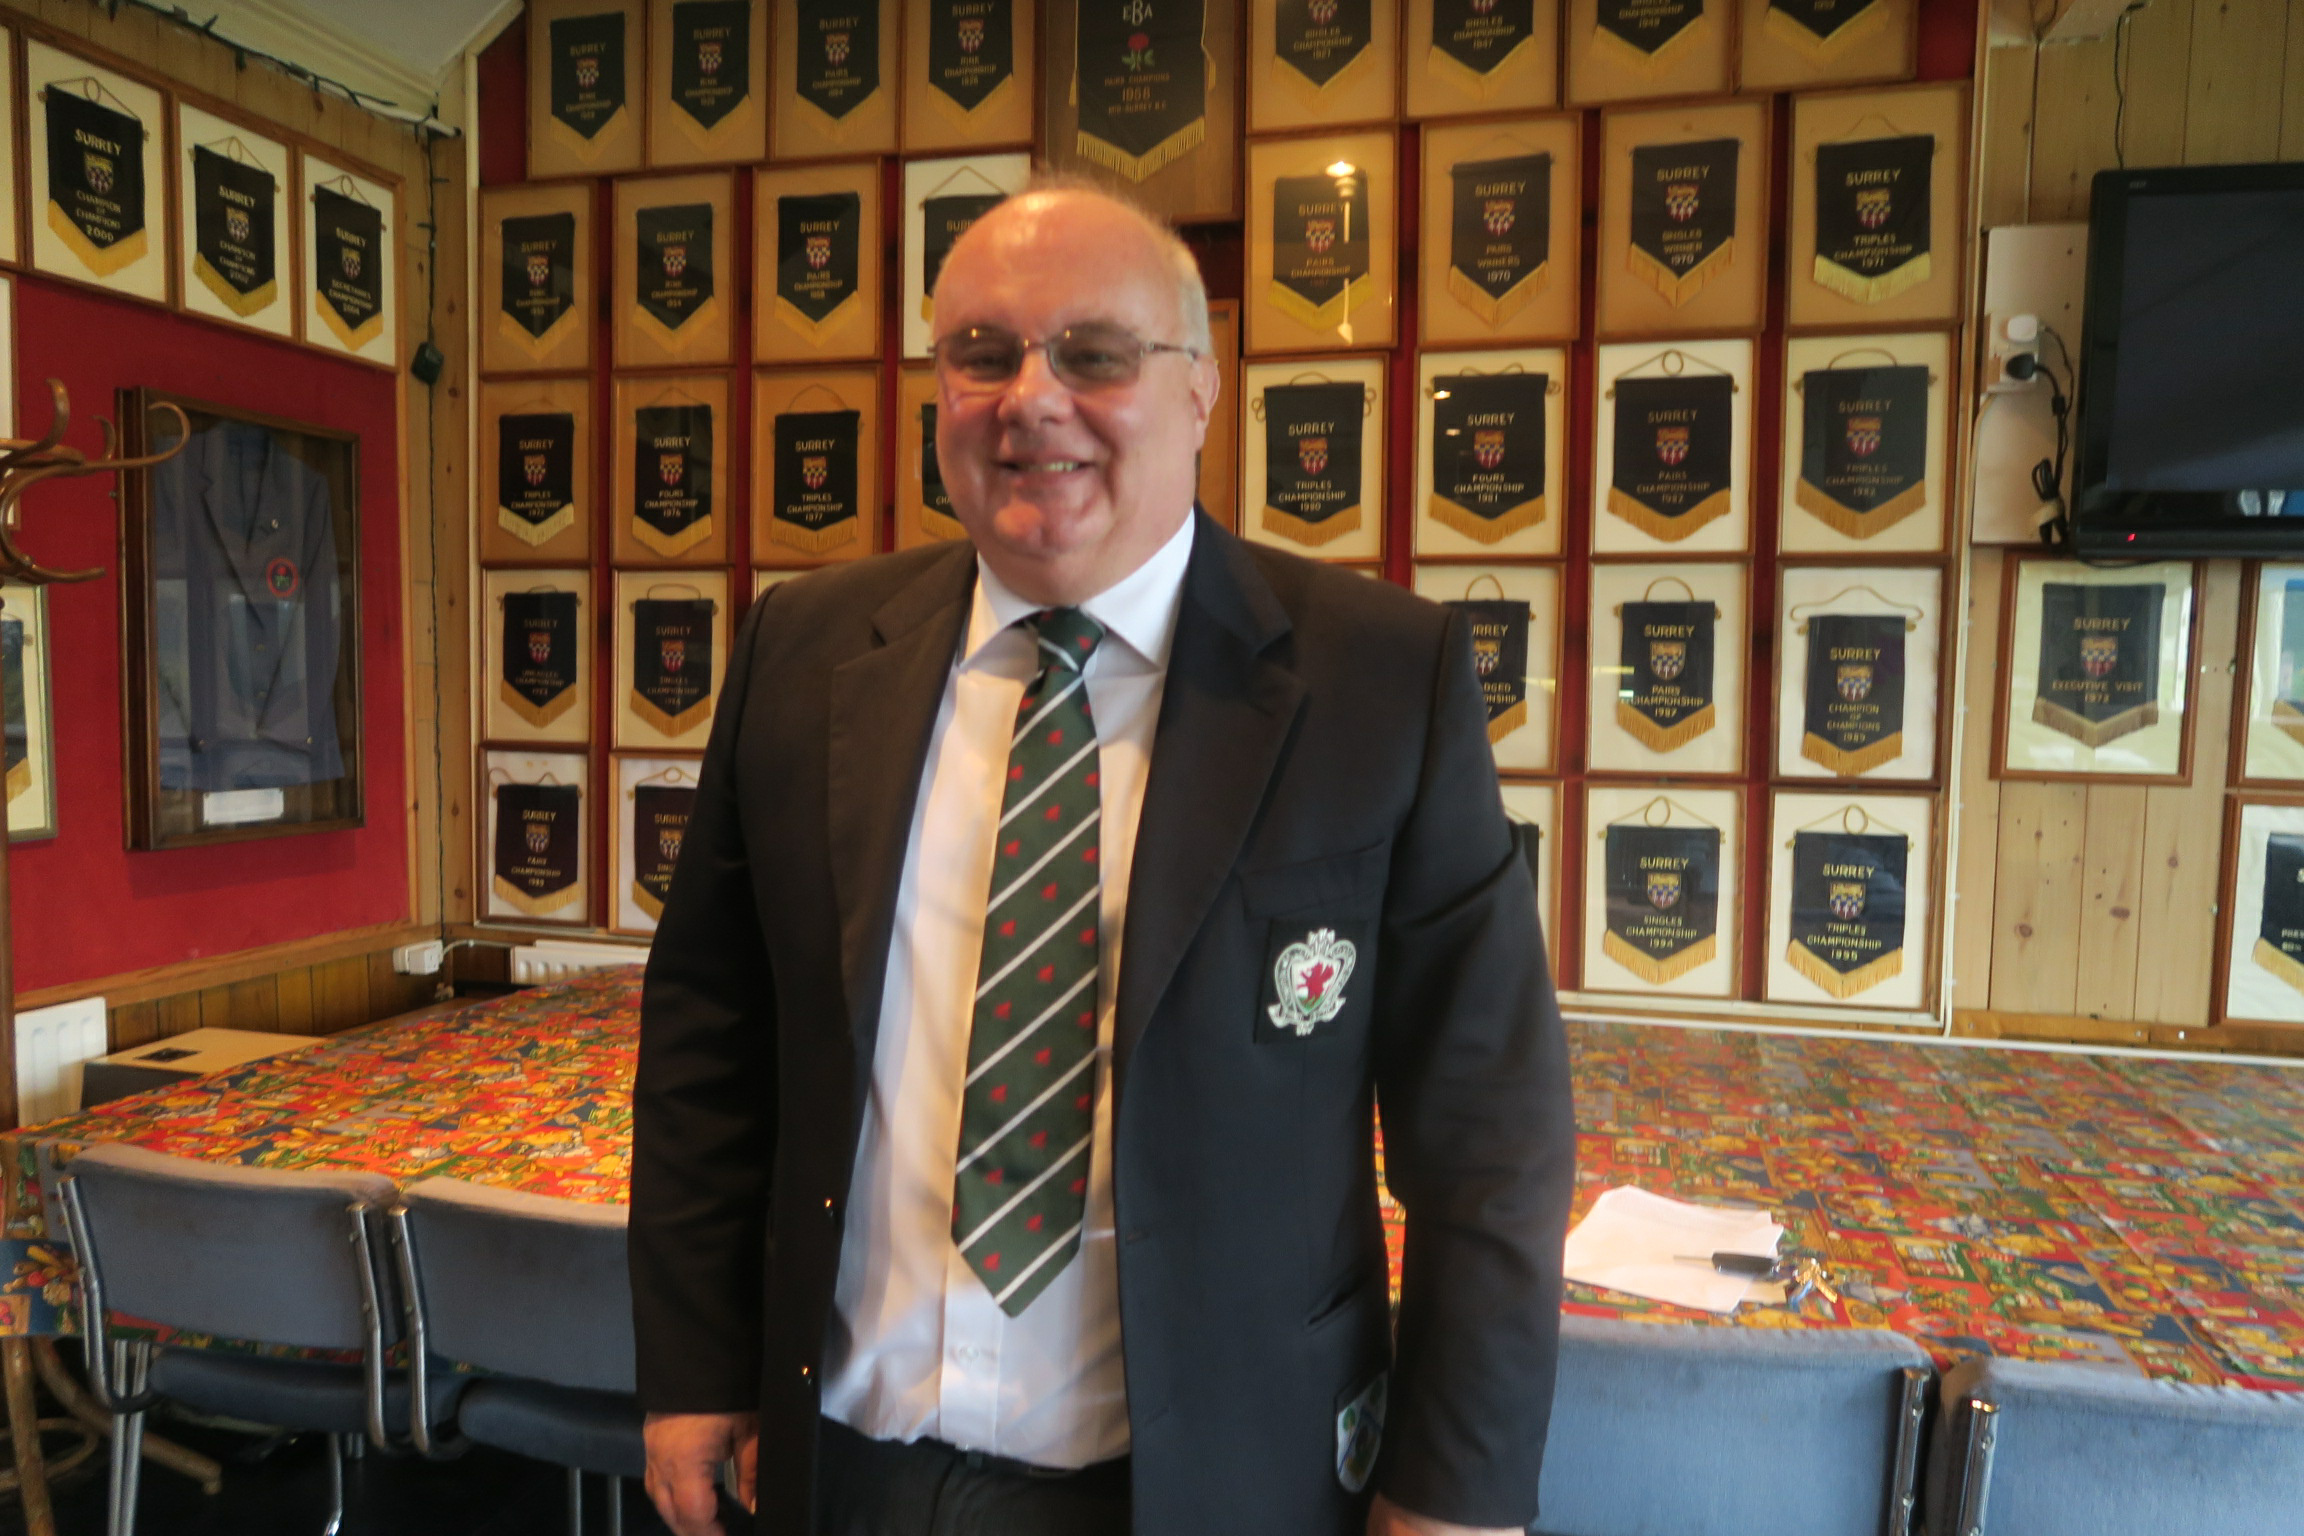 President & Honorary Treasurer - David Lloyd